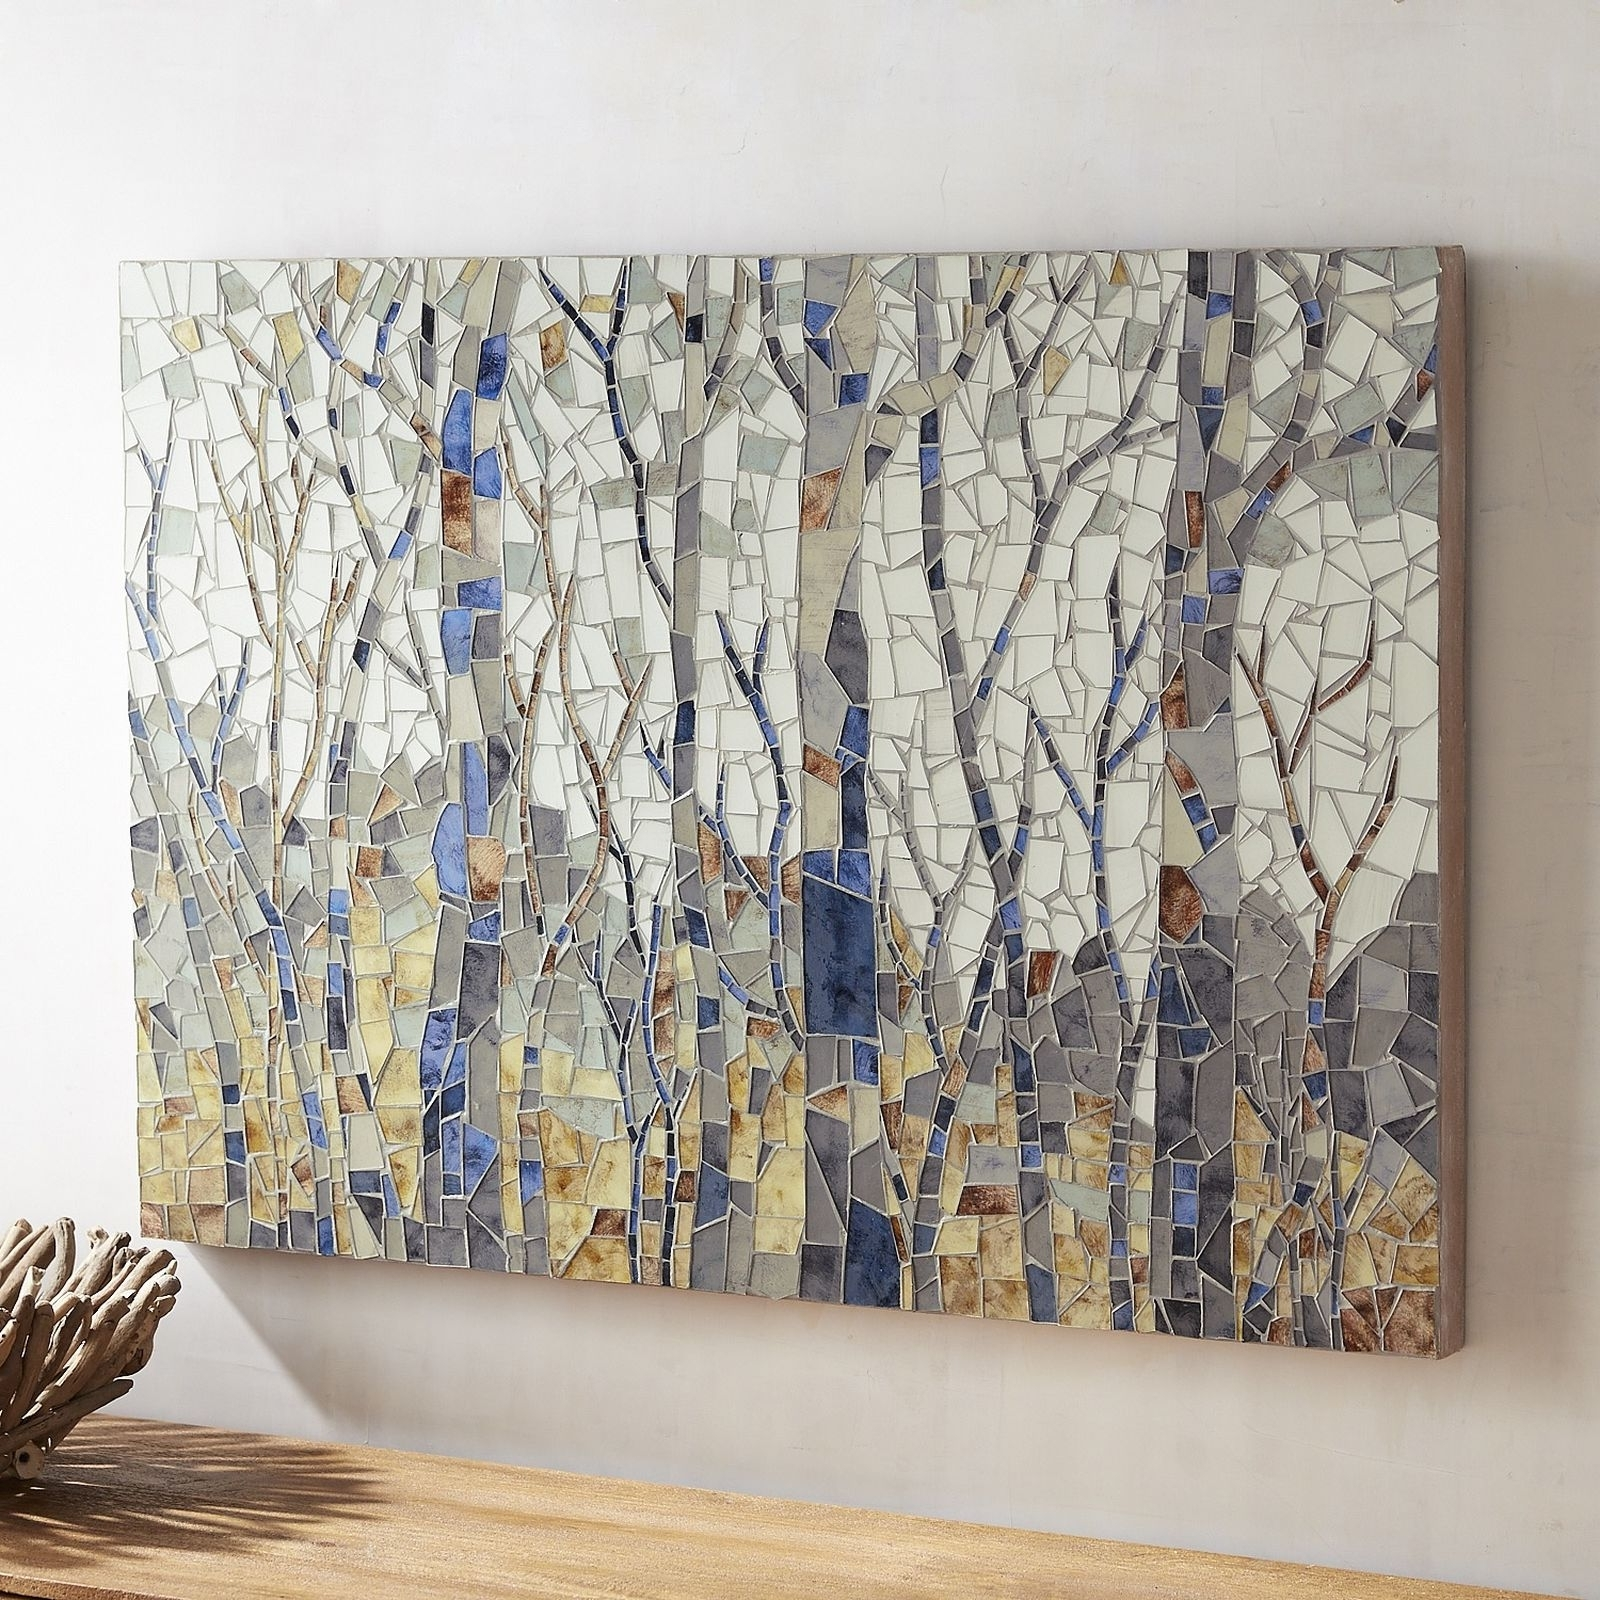 Mosaic Wall Art Regarding Well Known Mosaic Wall Art Amazing Mosaic Wall Art – Wall Decoration Ideas (View 6 of 15)